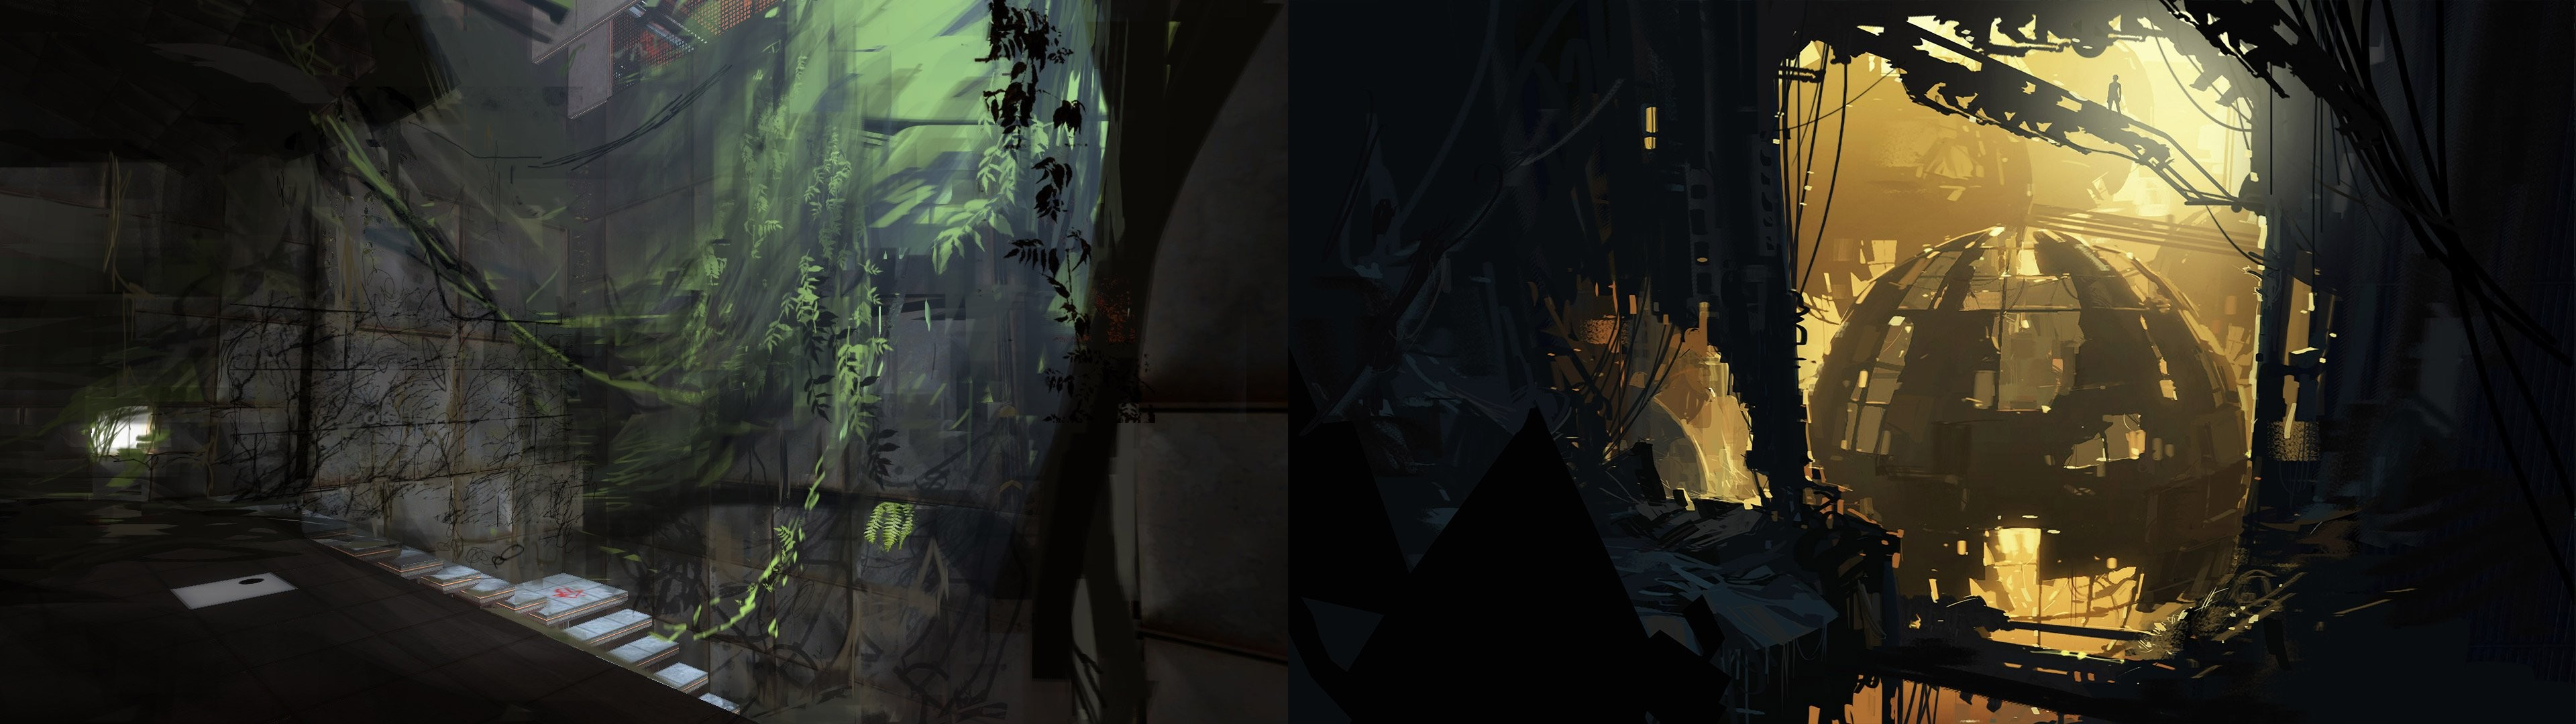 Dual monitor screen portal game wallpaper | | 514364 | WallpaperUP